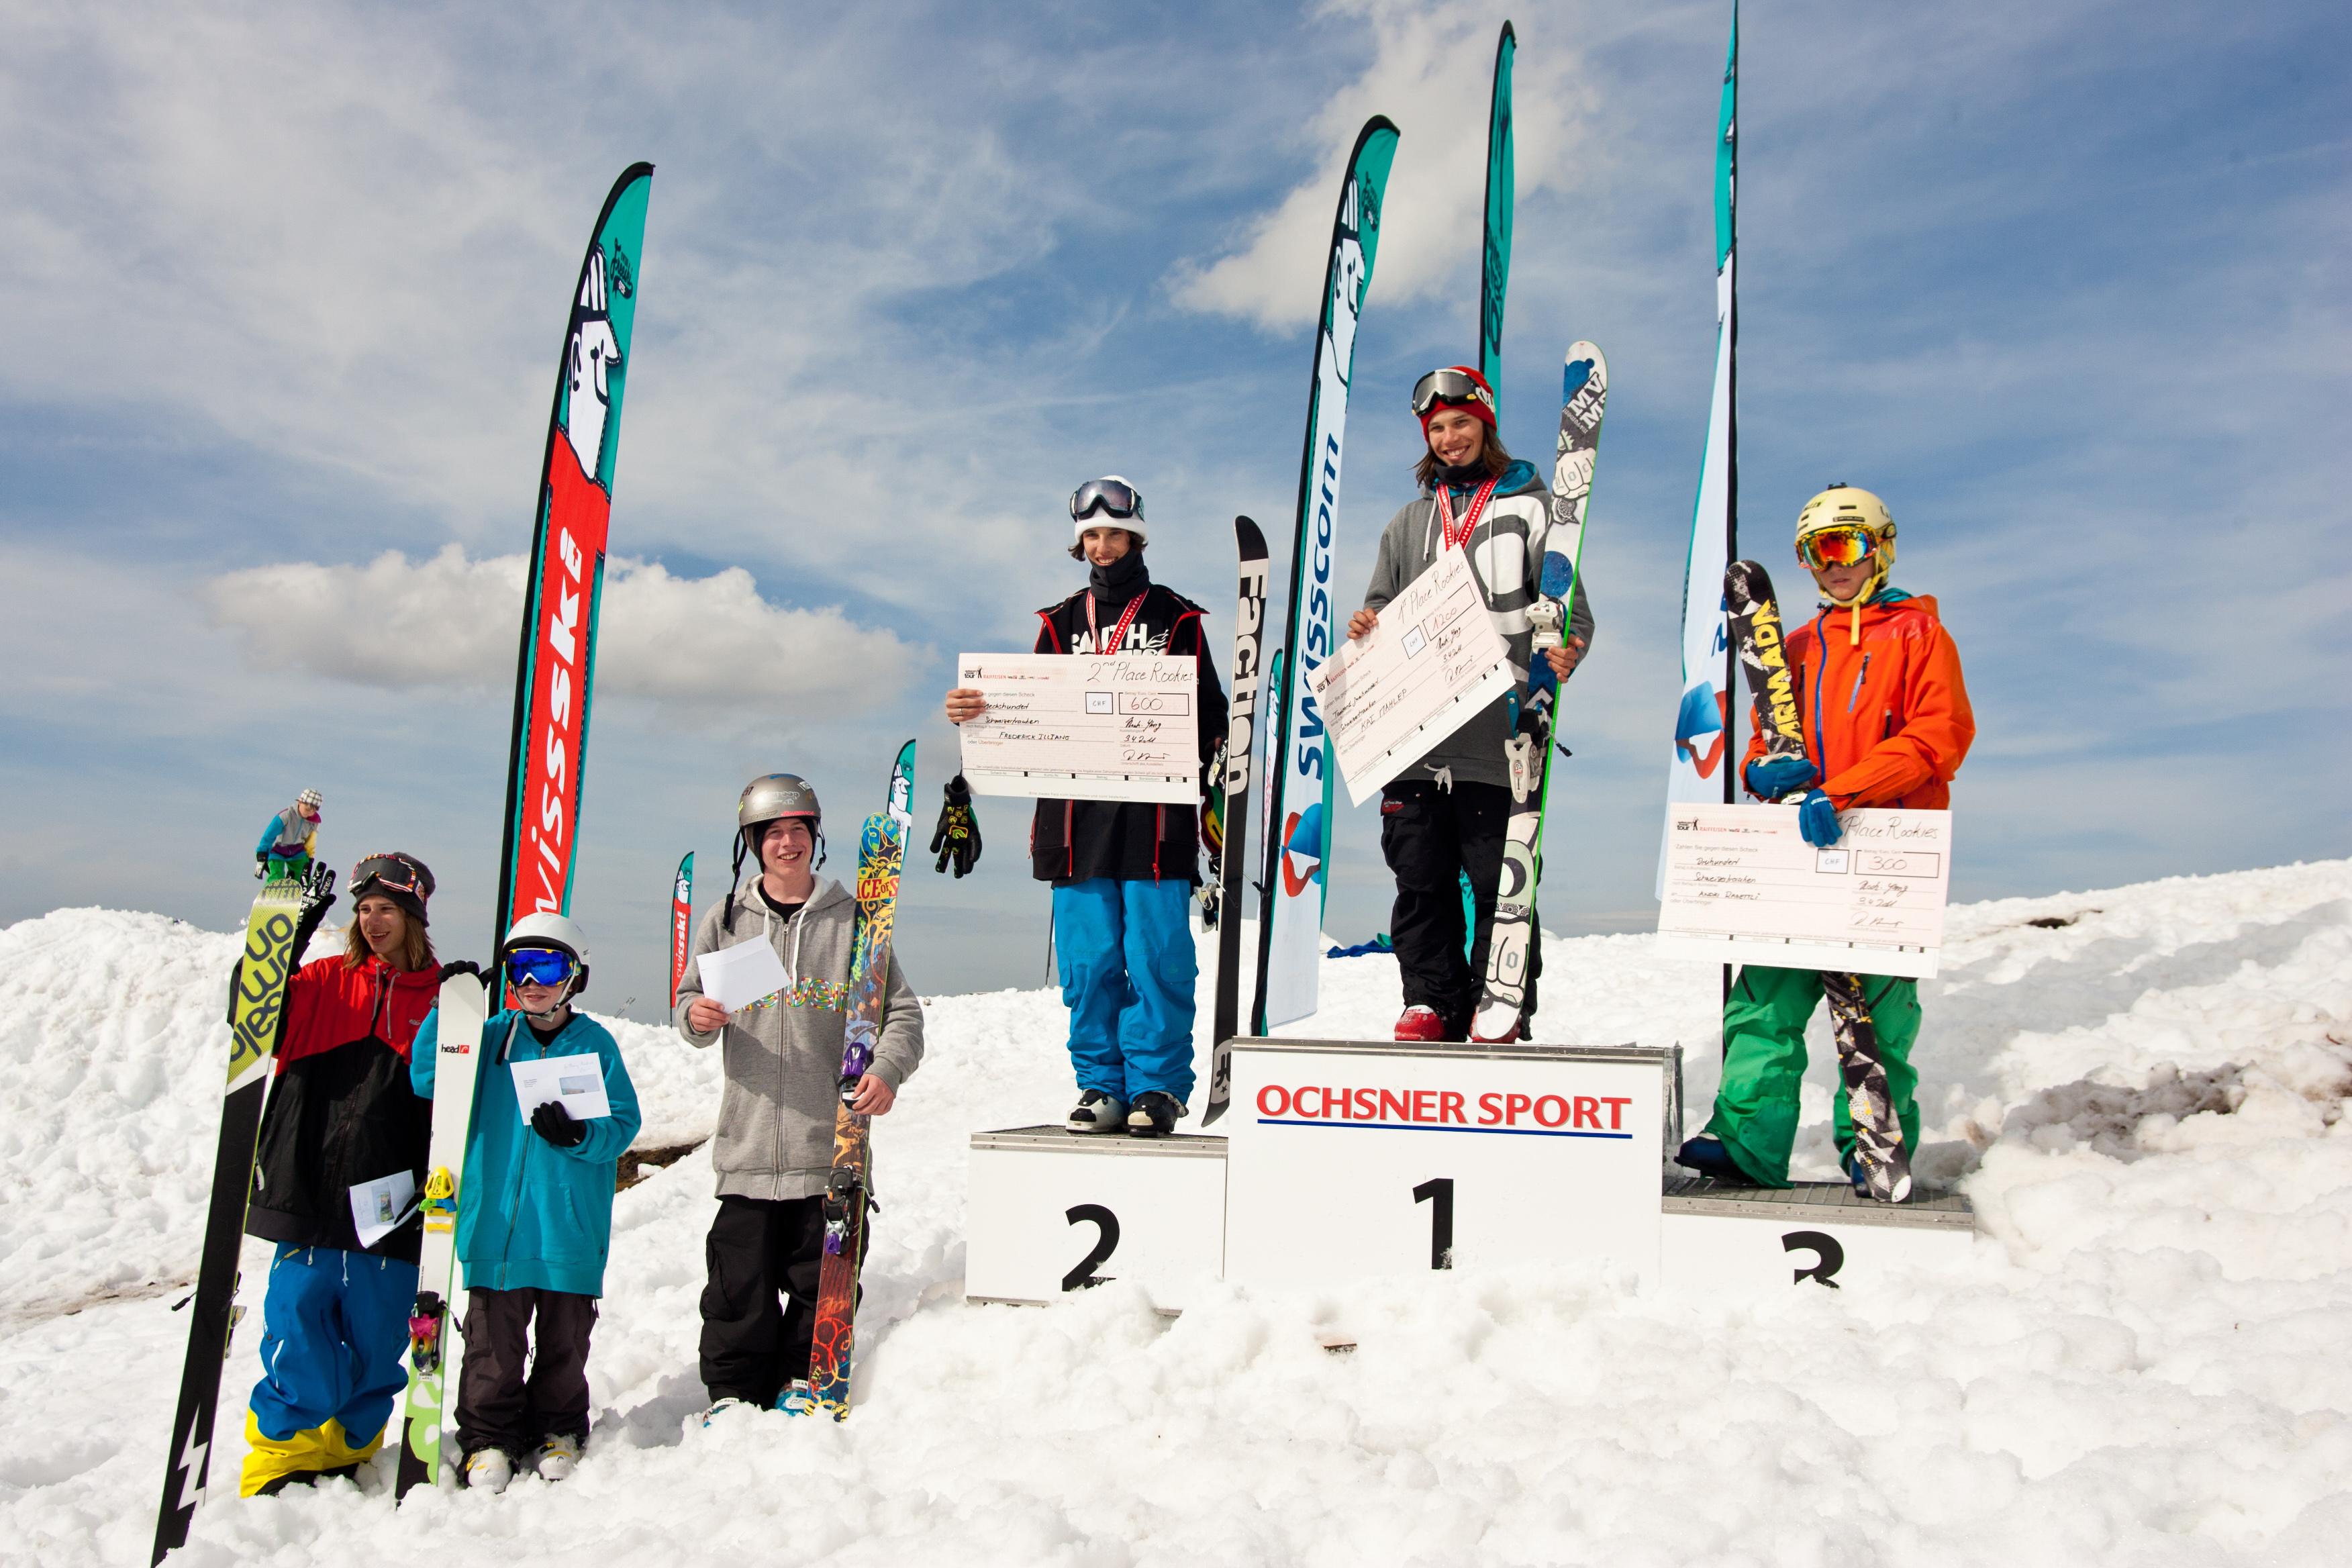 Bild 1 - Gewinner Rookies - Swisscom Freeski Tour- Hoyh-Ybrig